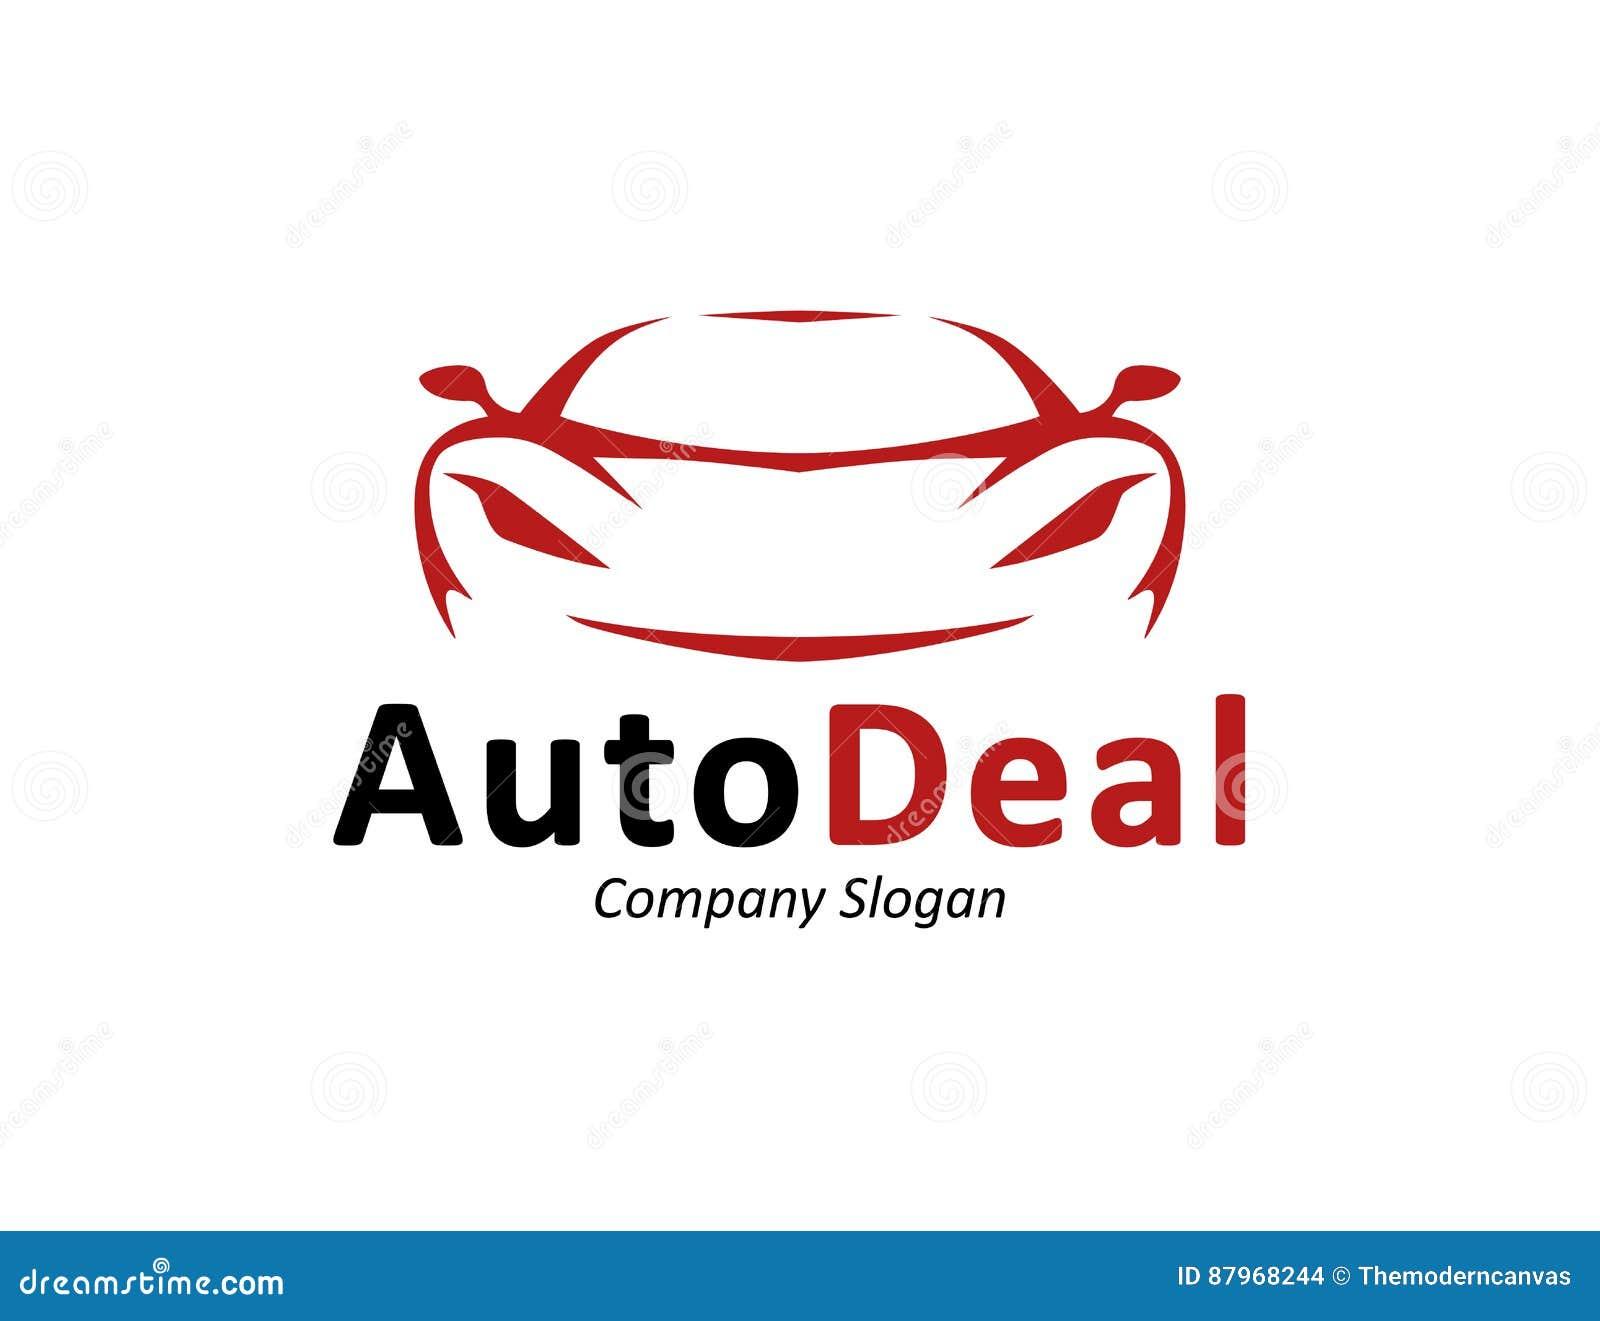 Car Dealership Logo Ideas